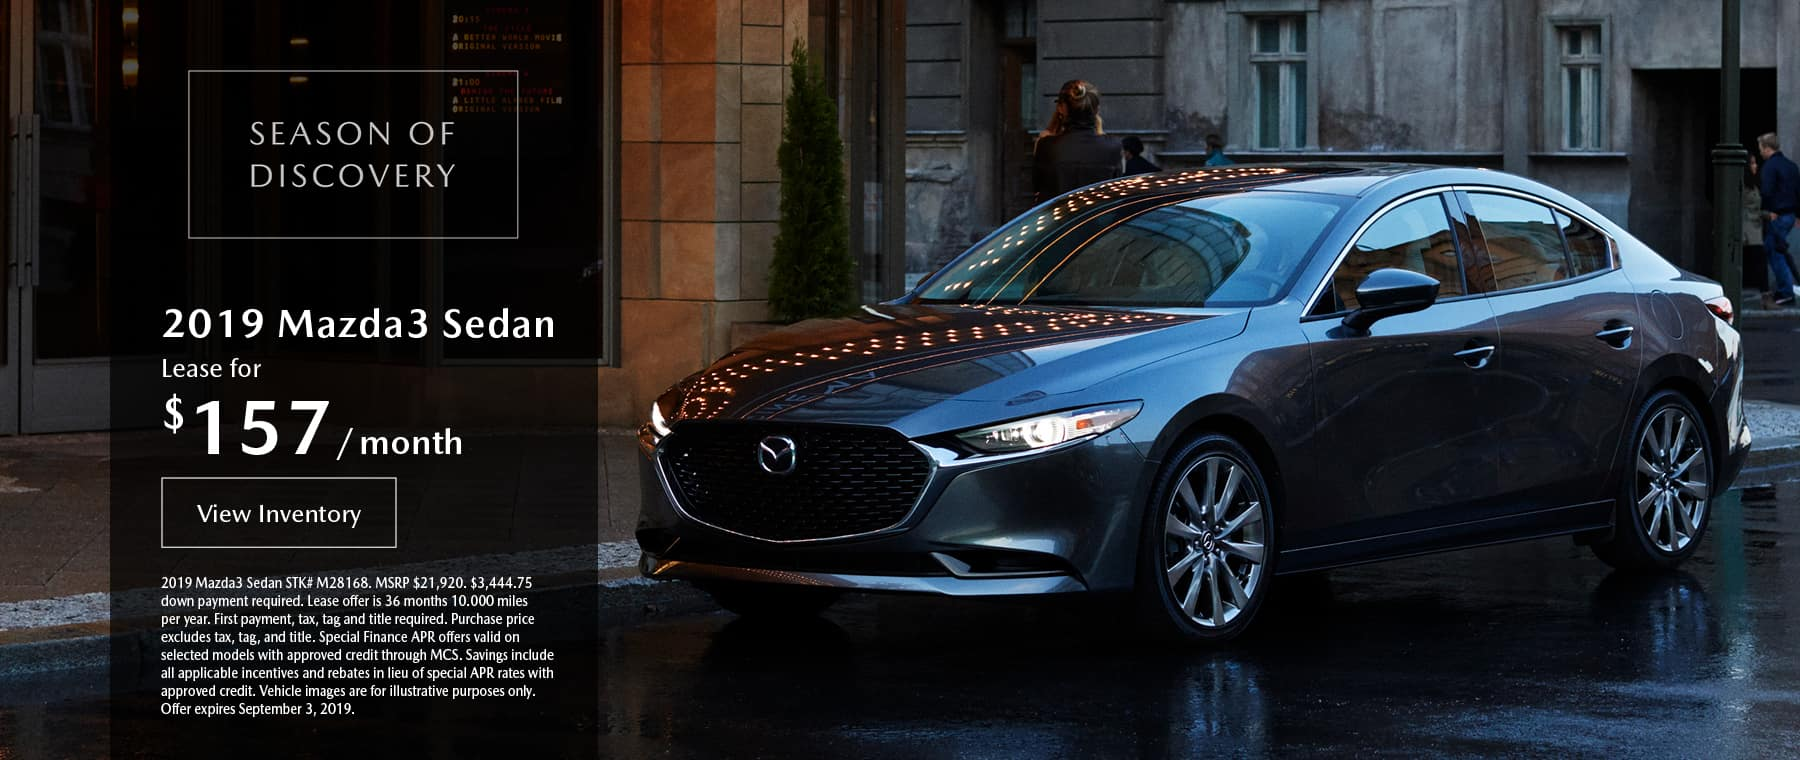 Lease the 2019 Mazda3 sedan for $157 per month, plus tax.